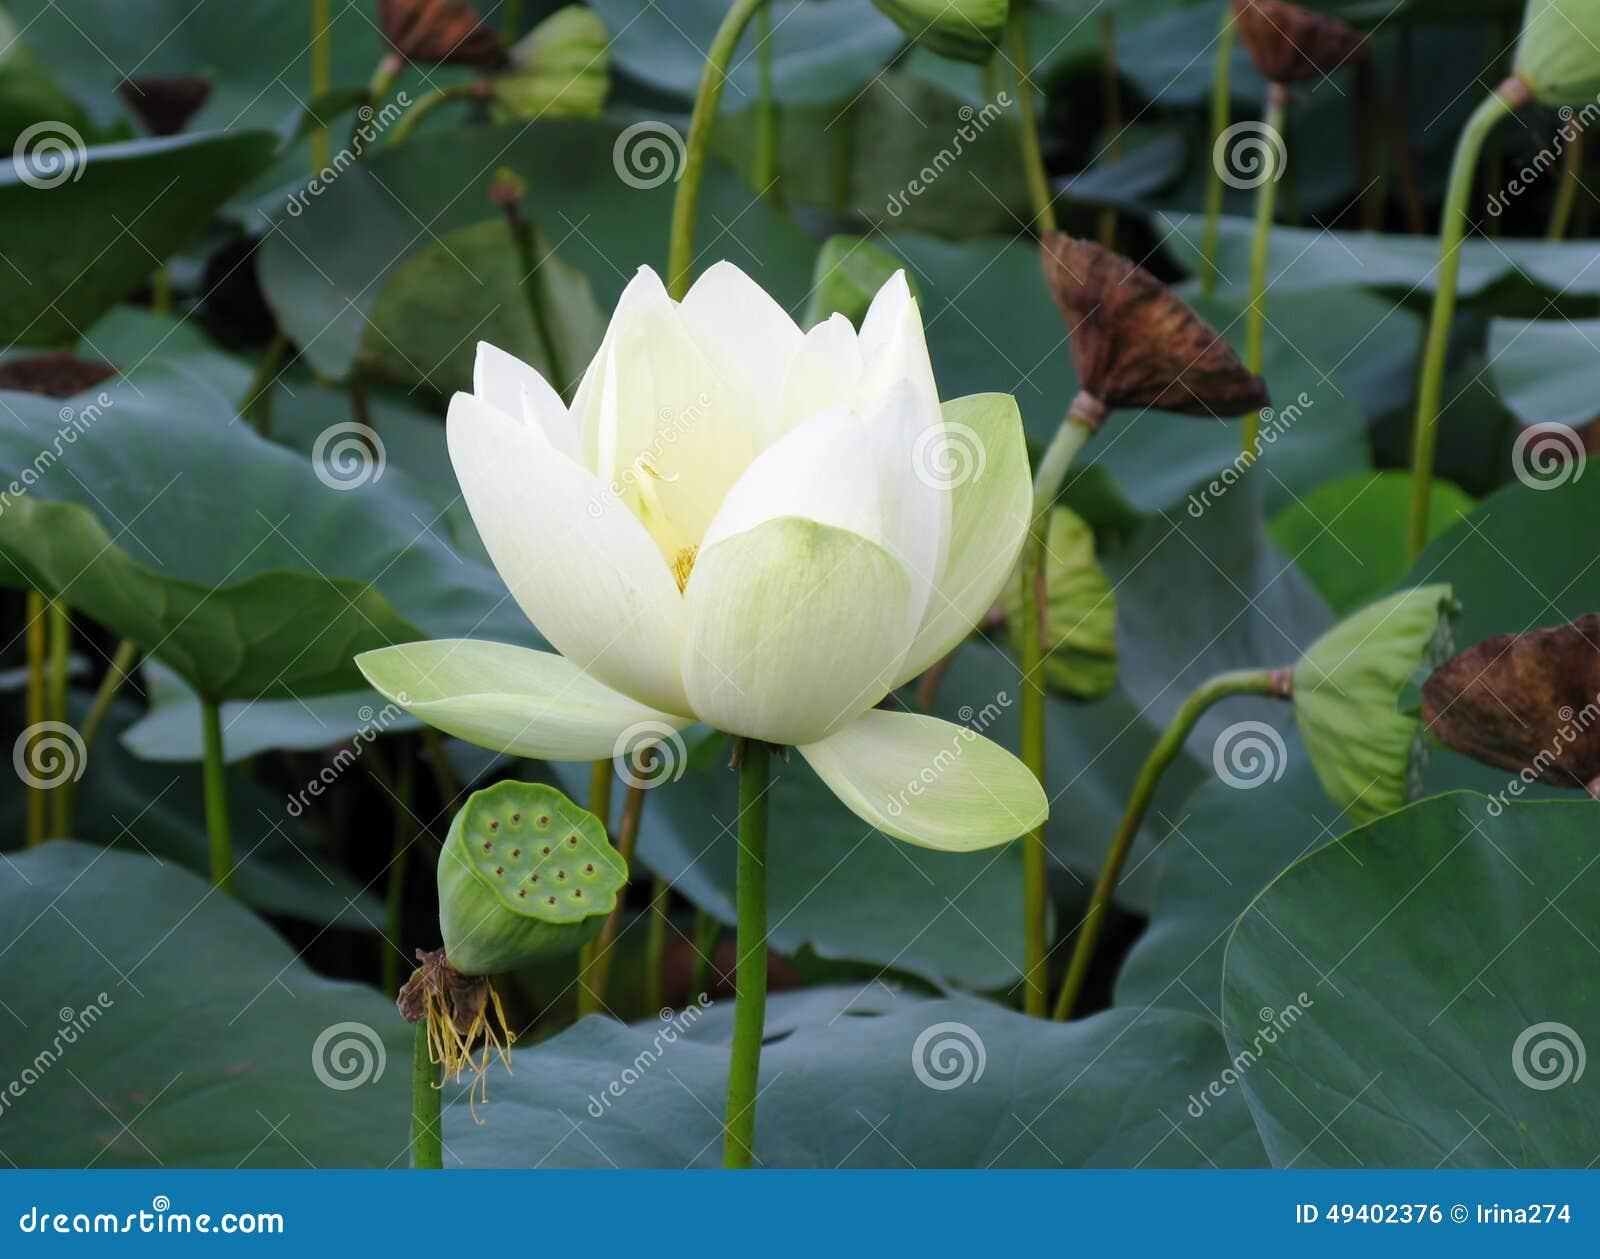 White Lotus Flower And Seedpods Stock Photo Image Of Nelumbo